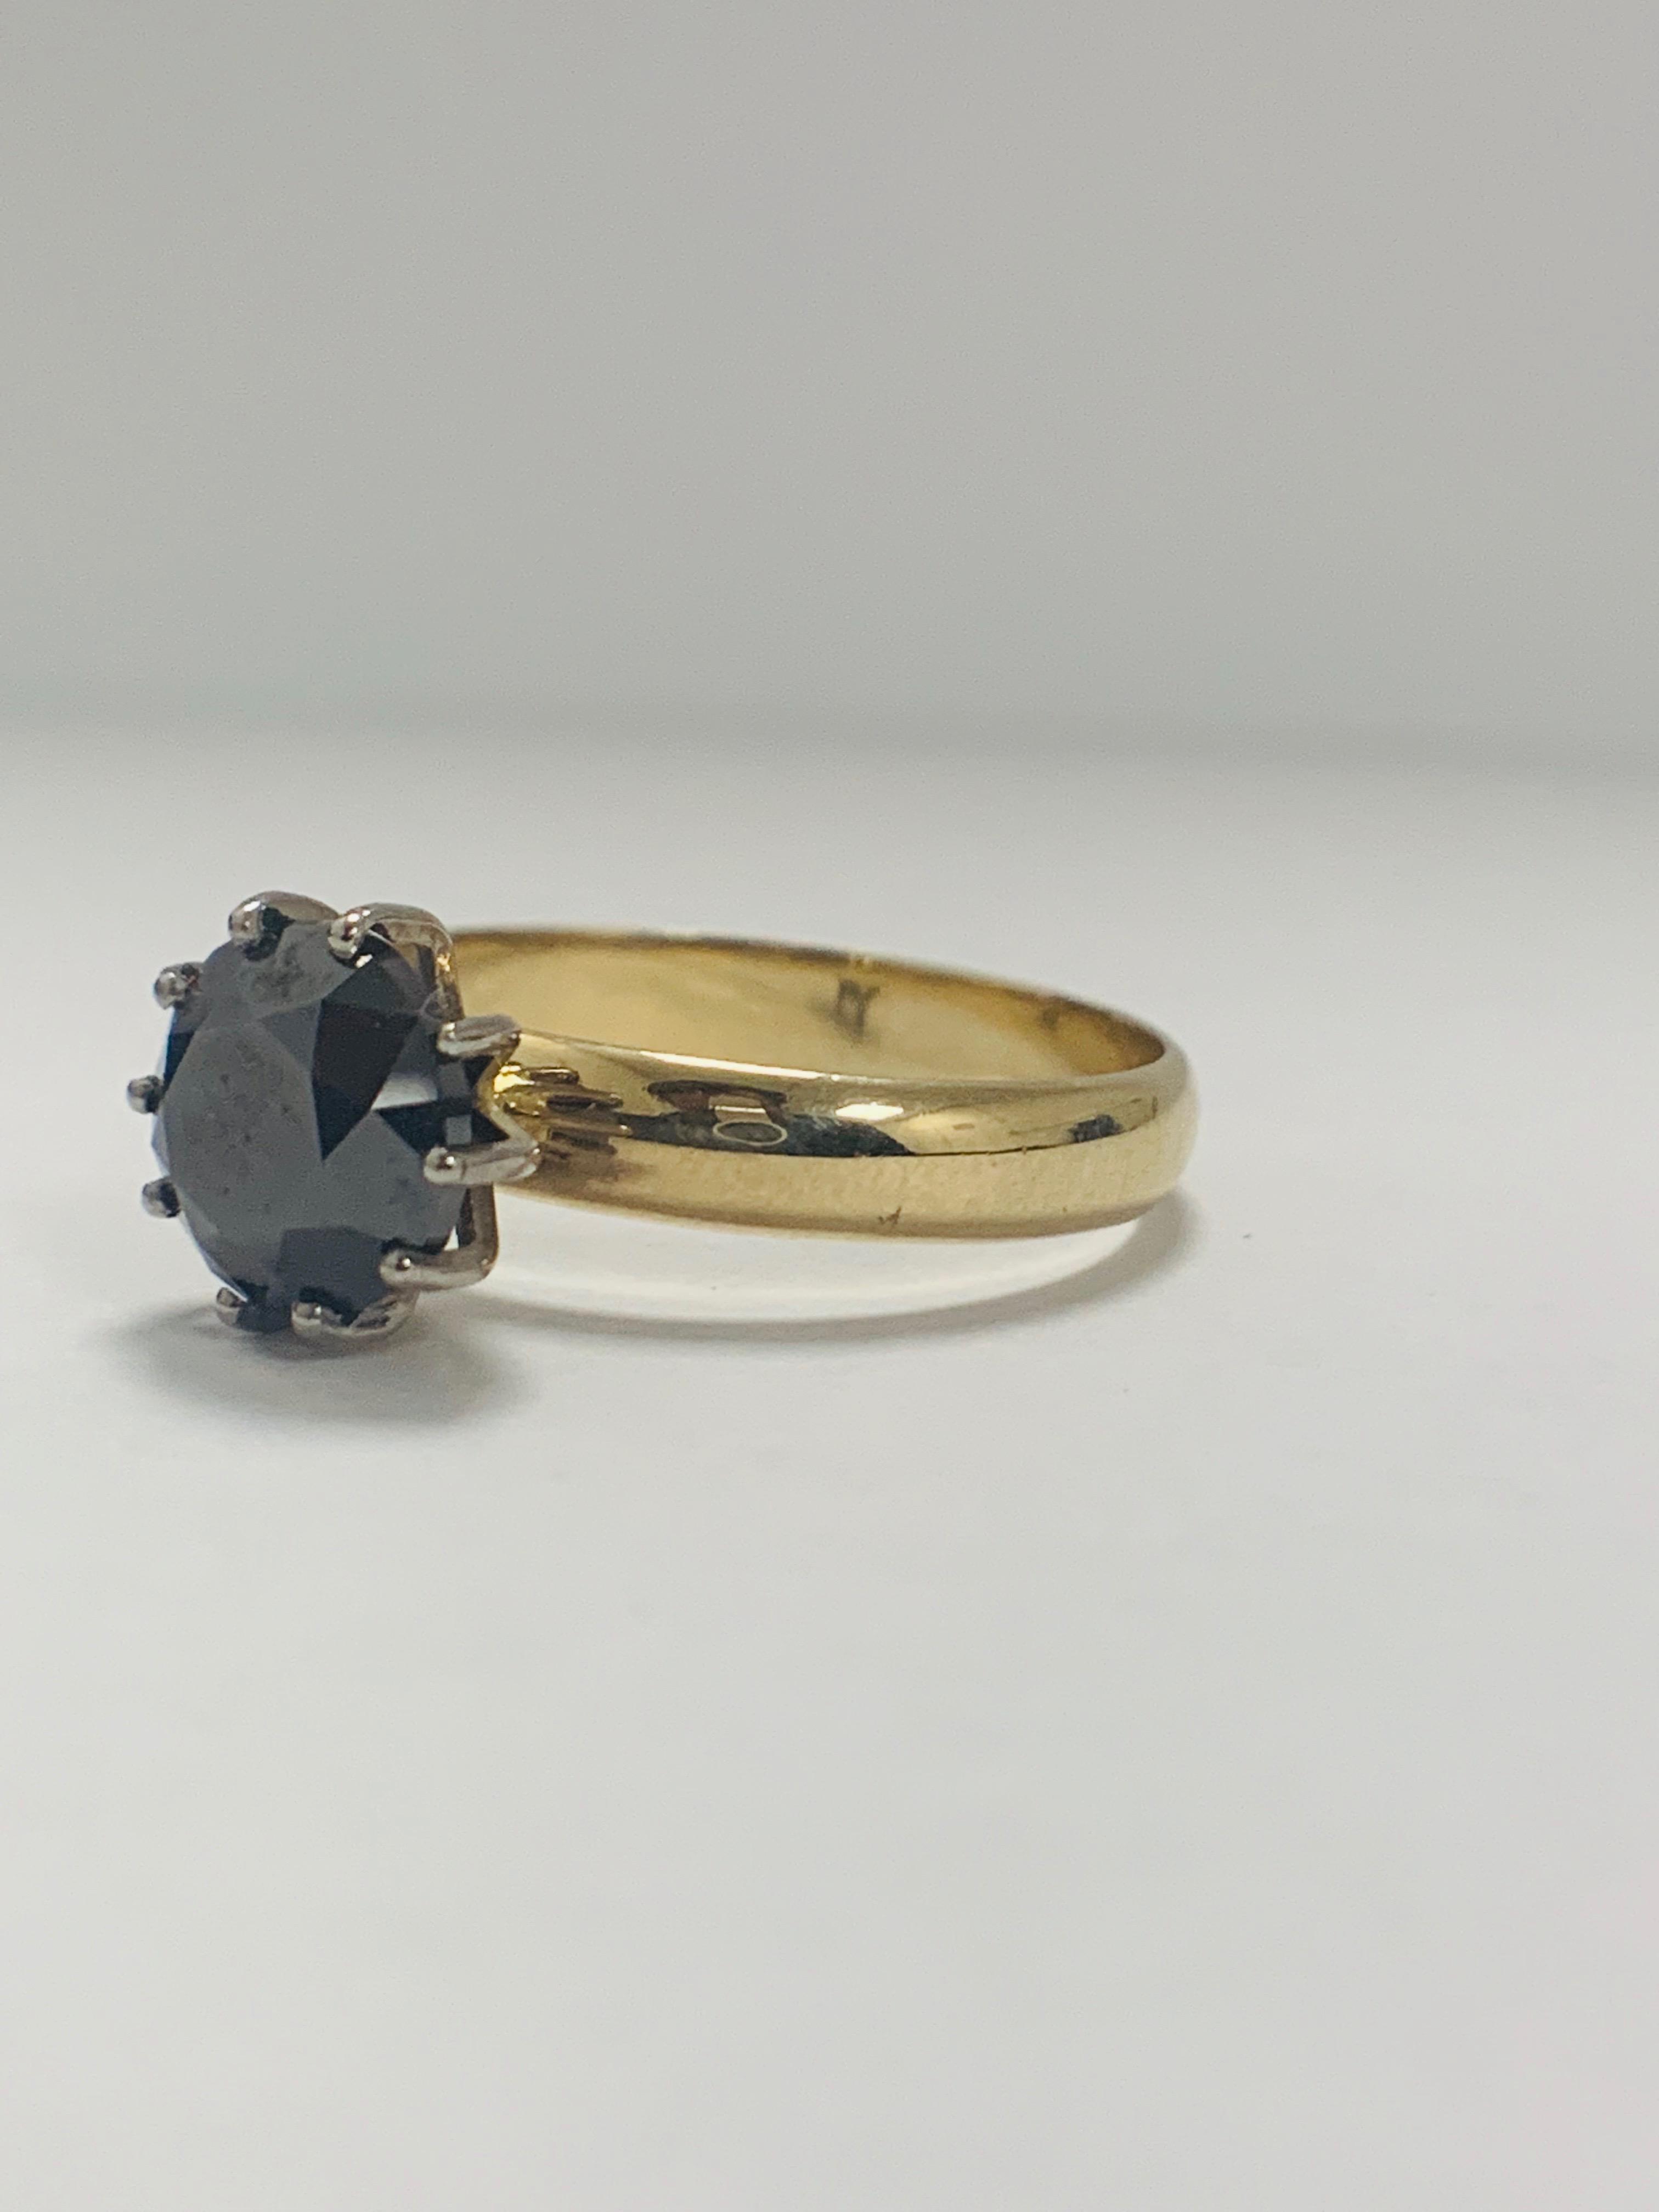 Lot 53 - 18ct Yellow Gold Diamond ring featuring centre, round brilliant cut, deep orangey brown Diamond (3.3